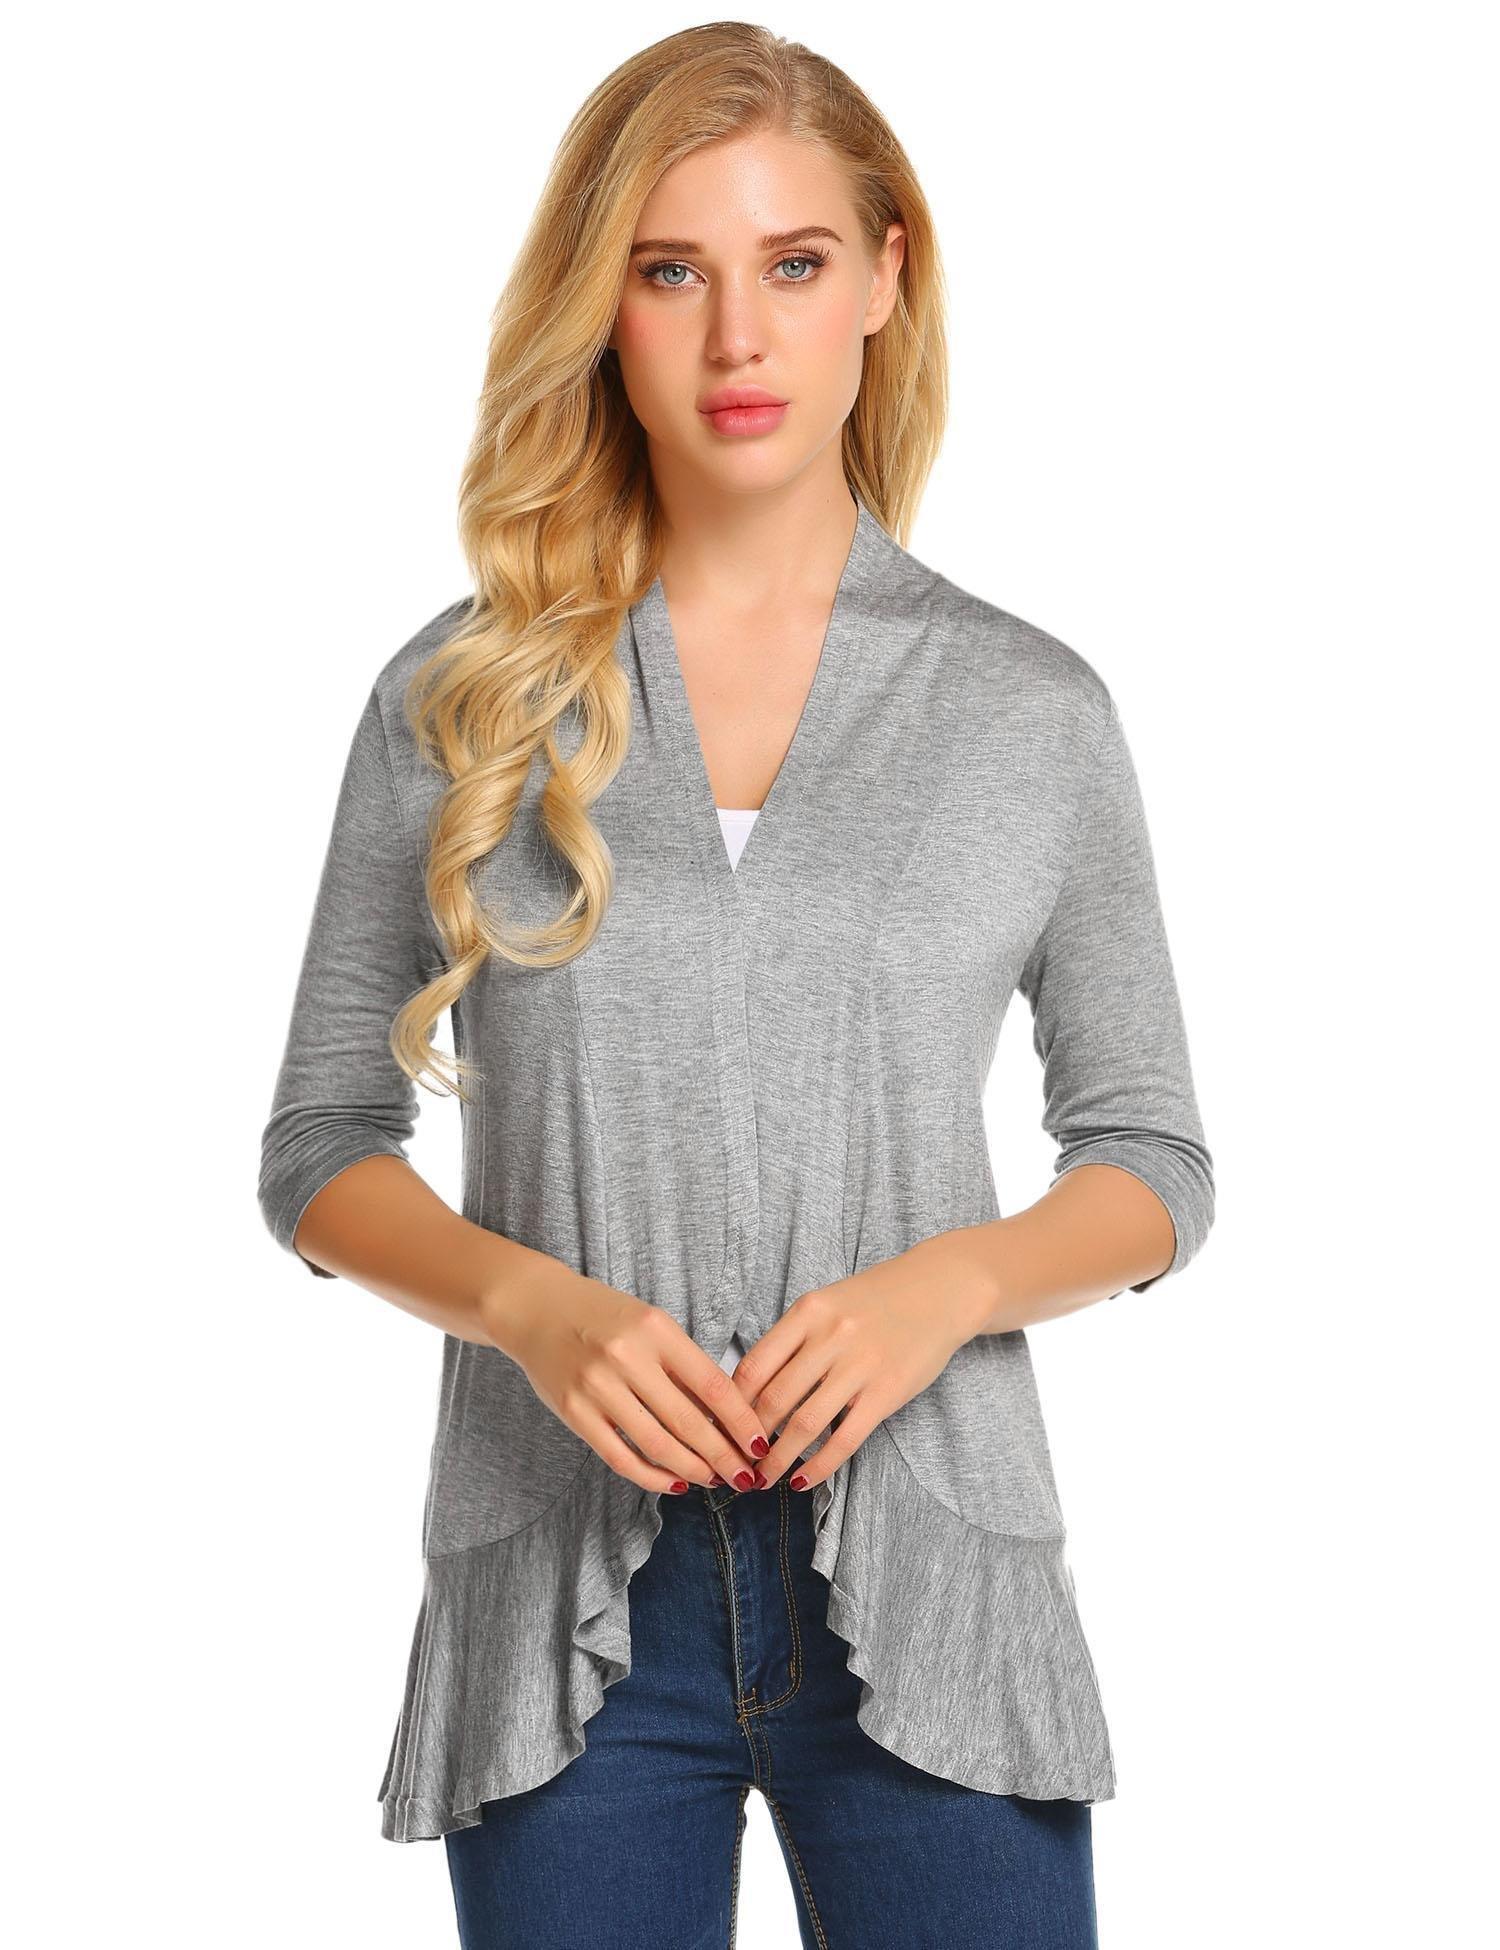 Zeagoo Womens Open Front 3/4 Sleeve Draped Ruffles Knit Cardigan,1-grey,Medium